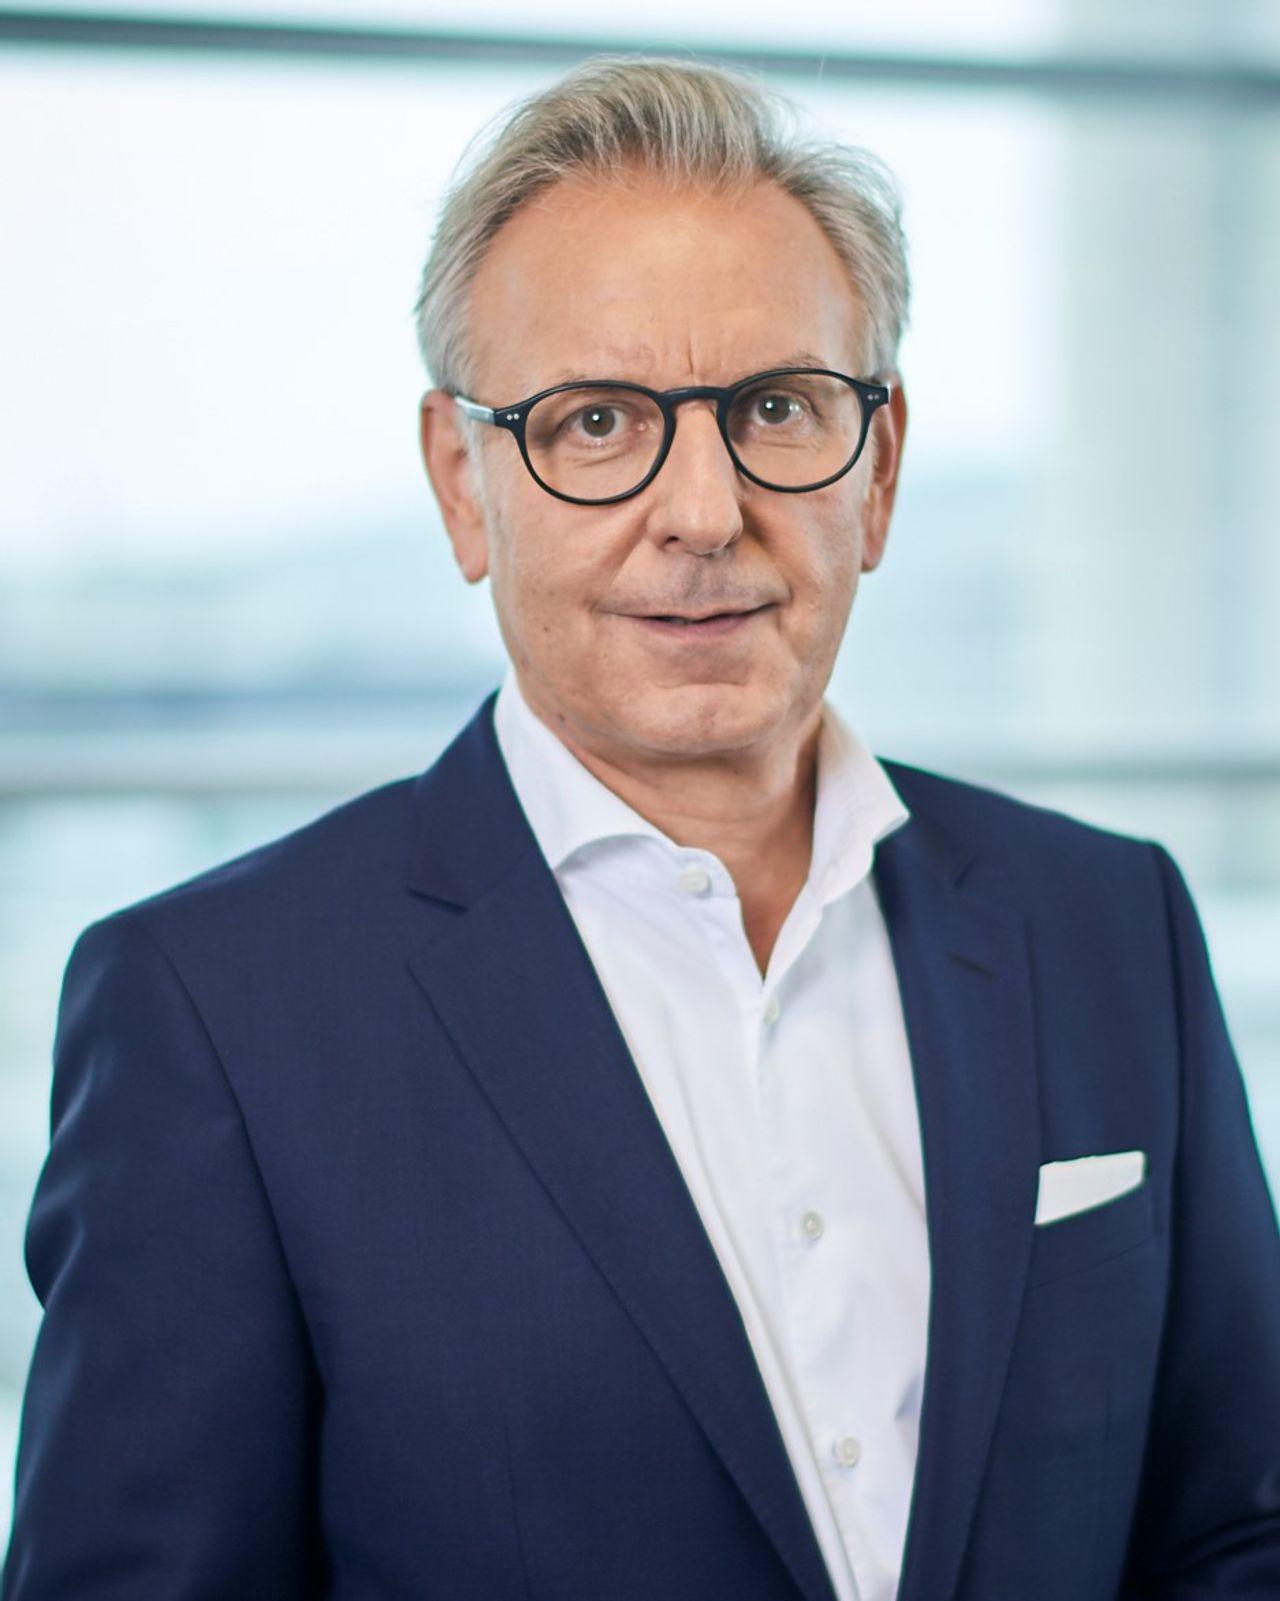 Stefan Erwin Buchner